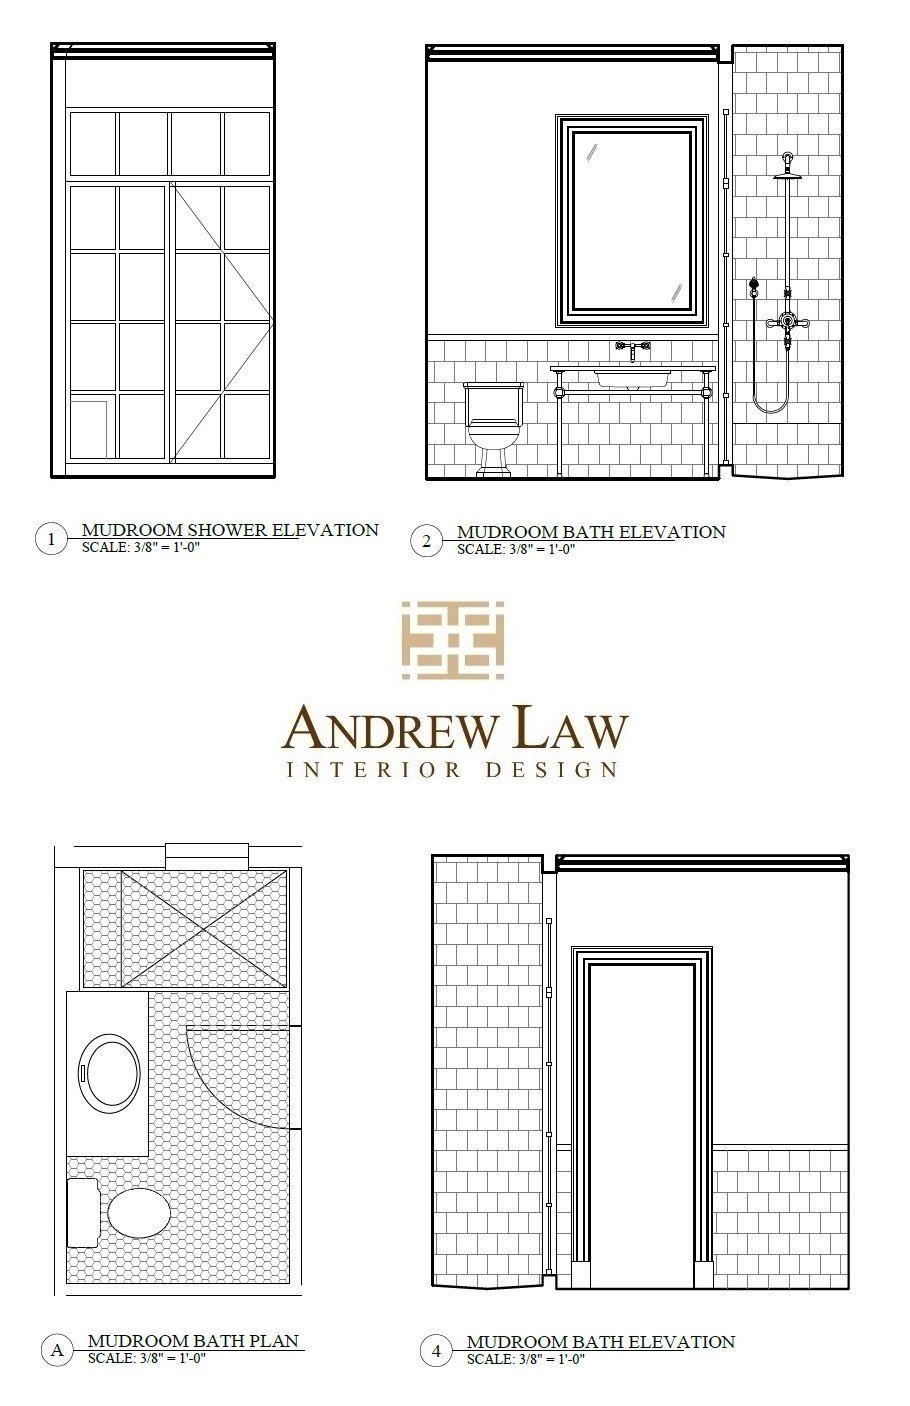 Bethesdastyle Mudroom Bath Elevations From Andrew Law Interior